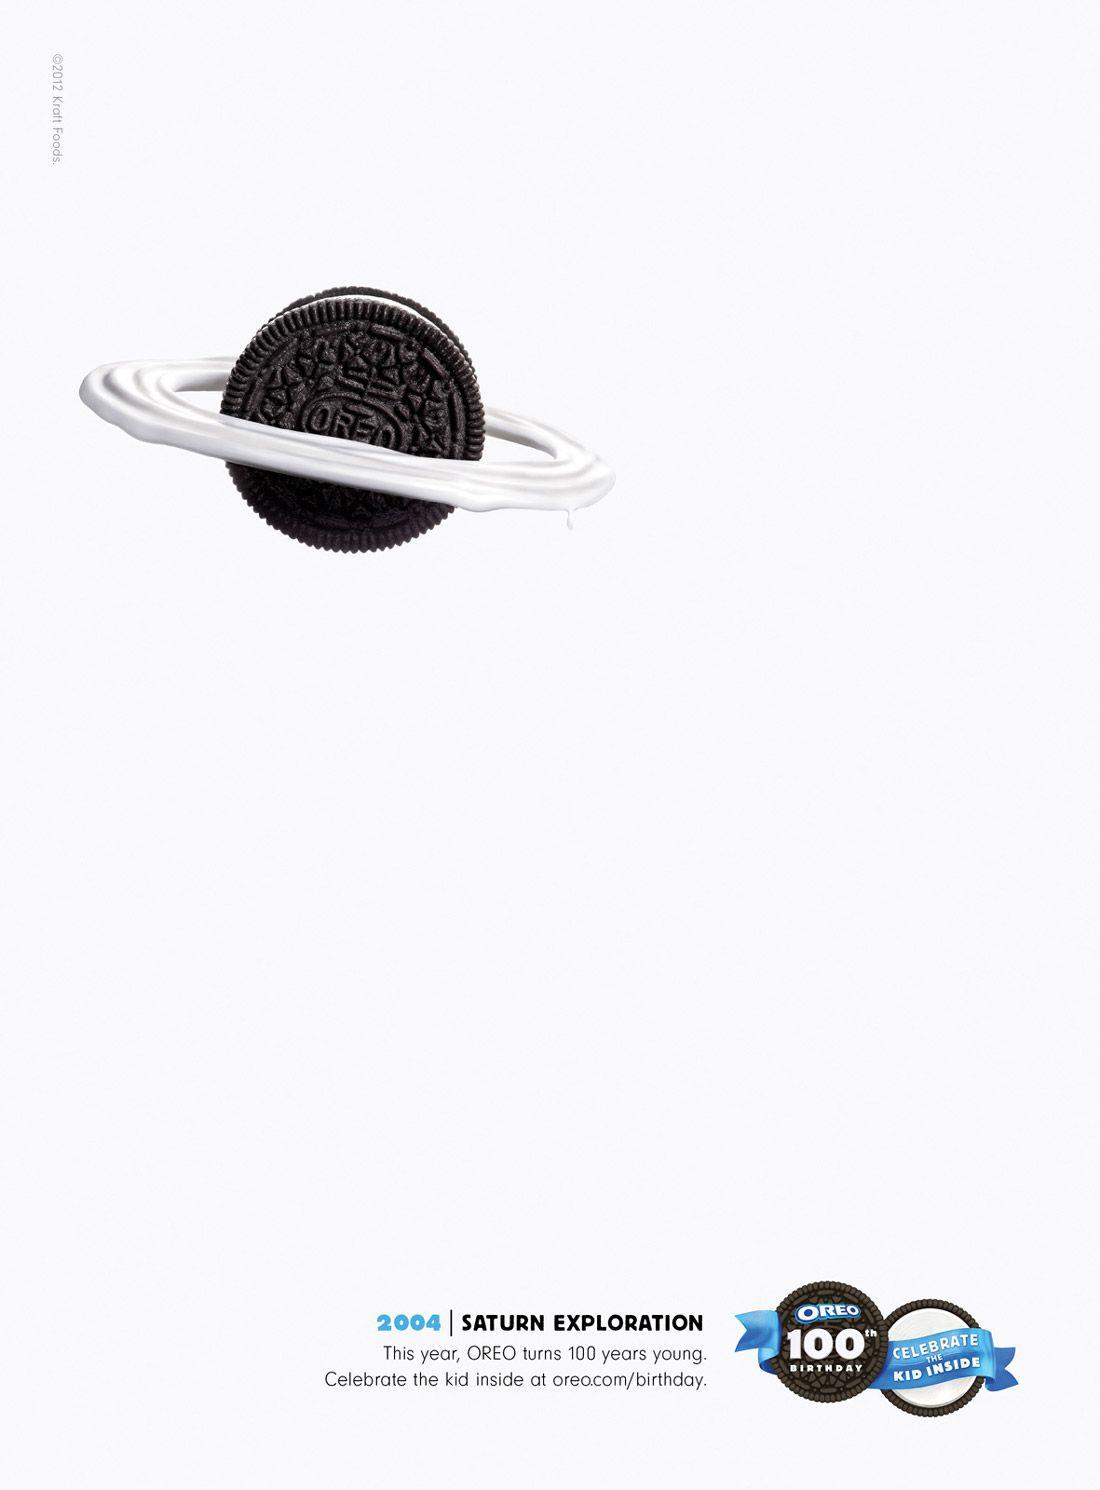 Oreo Ads 100th Birthday - Saturn Exploration